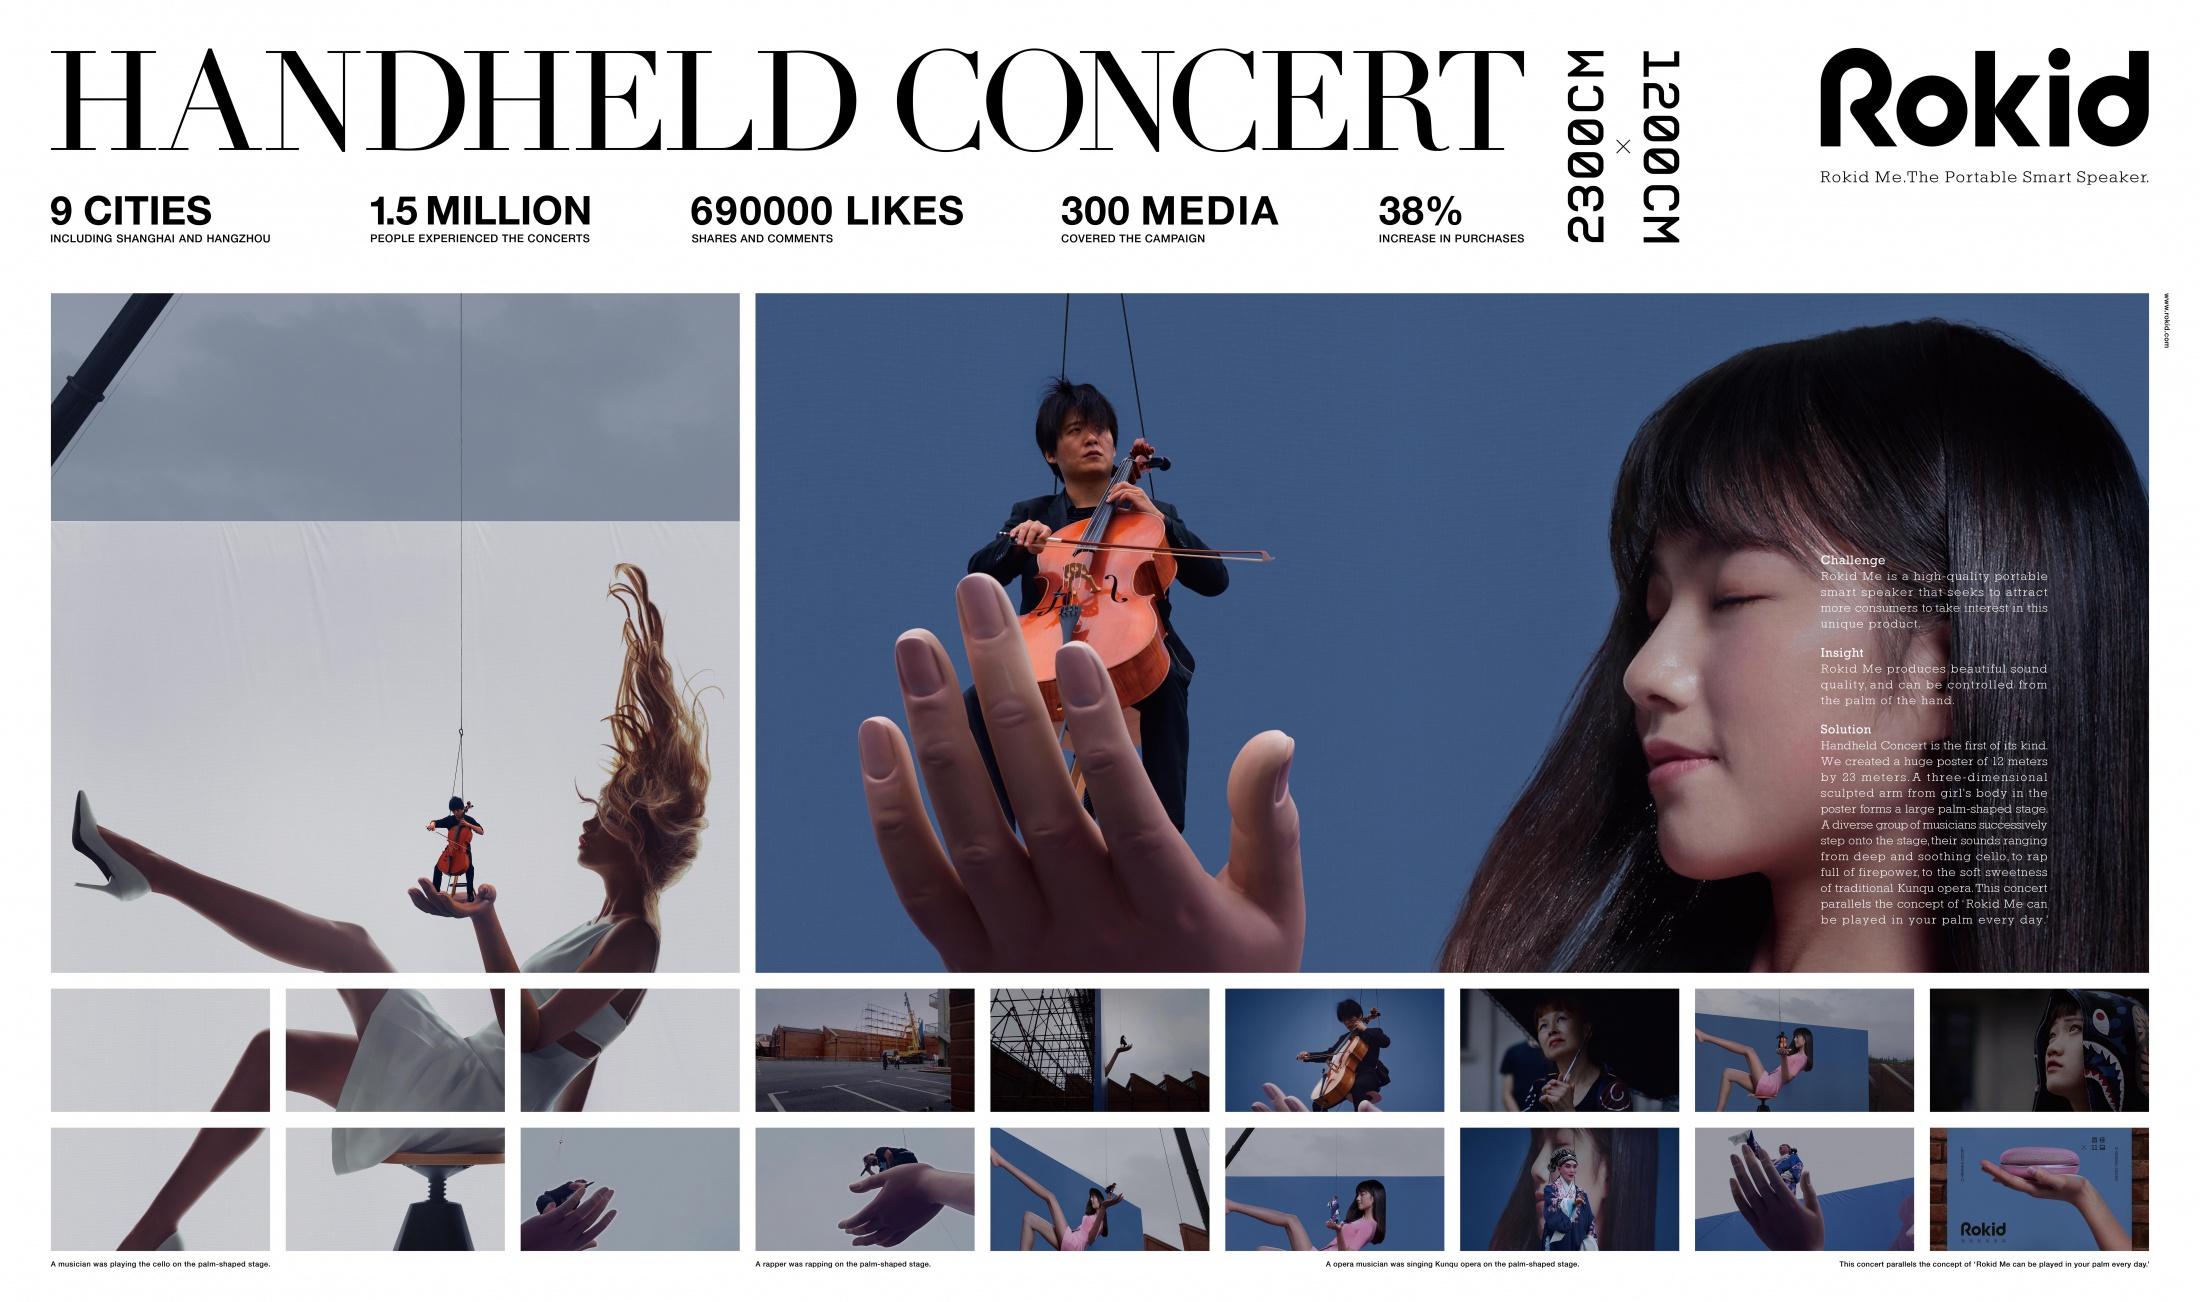 Thumbnail for Handheld Concert